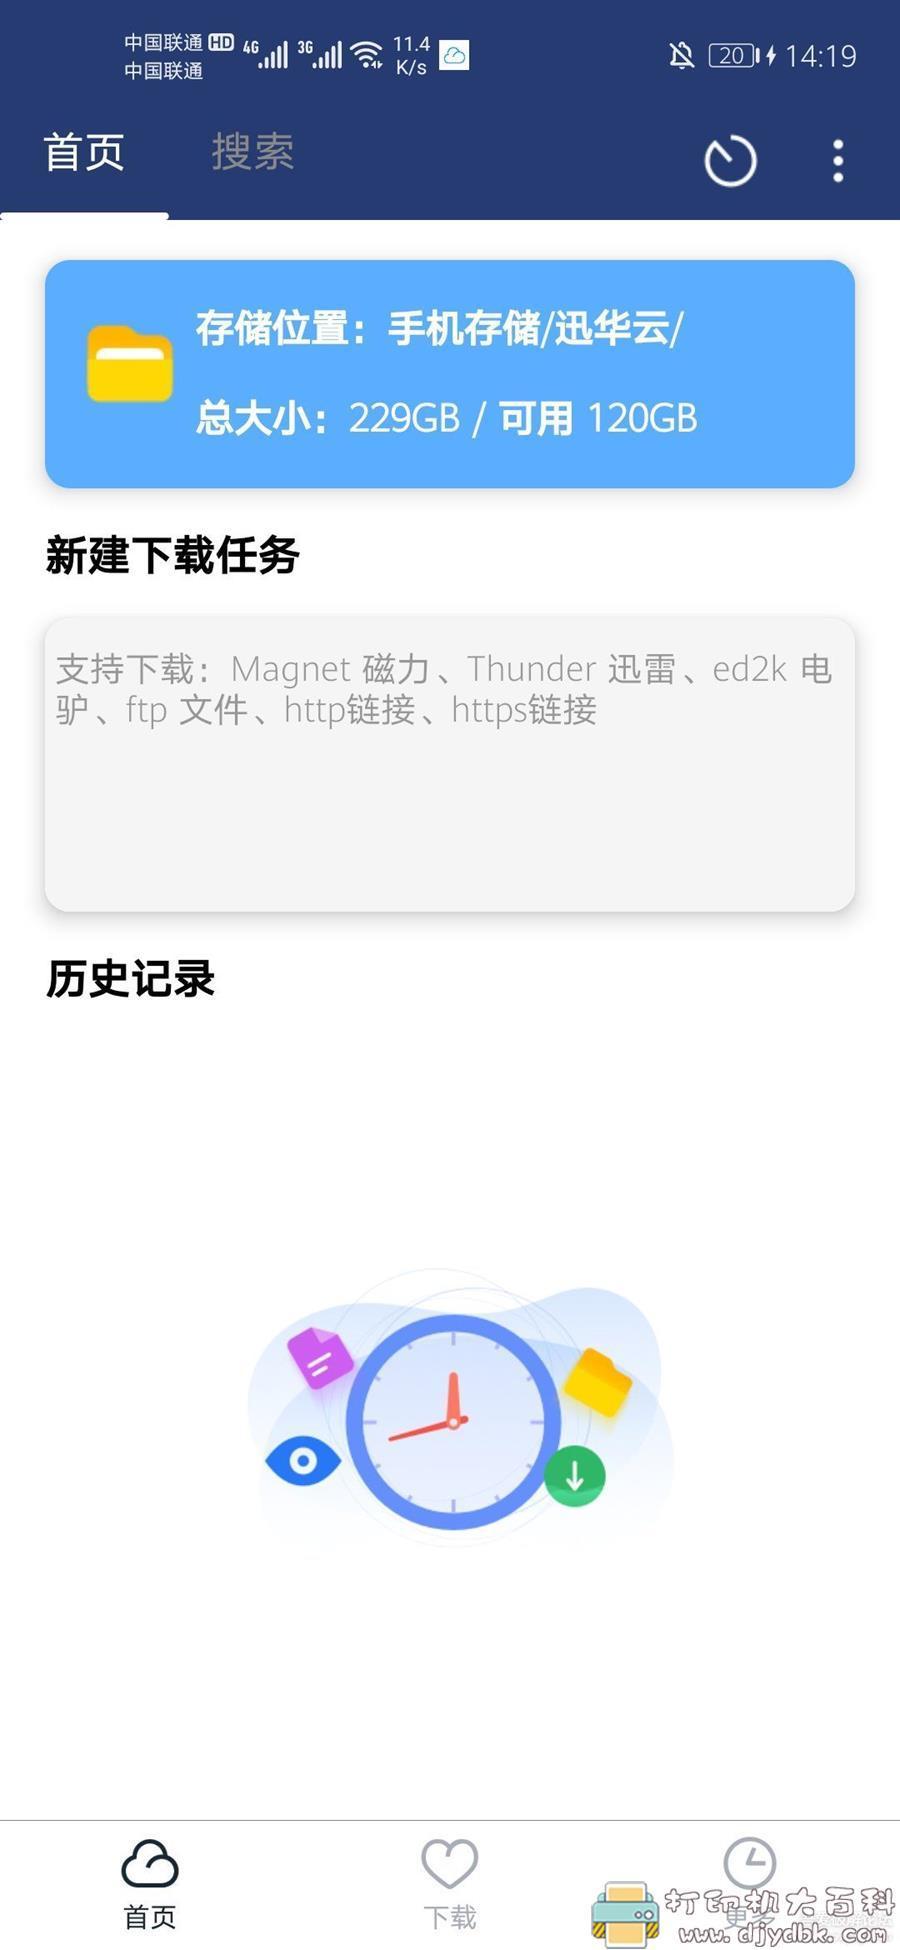 [Android]迅华云下载器V1.4,磁力链接无限速高速下载神器图片 No.1